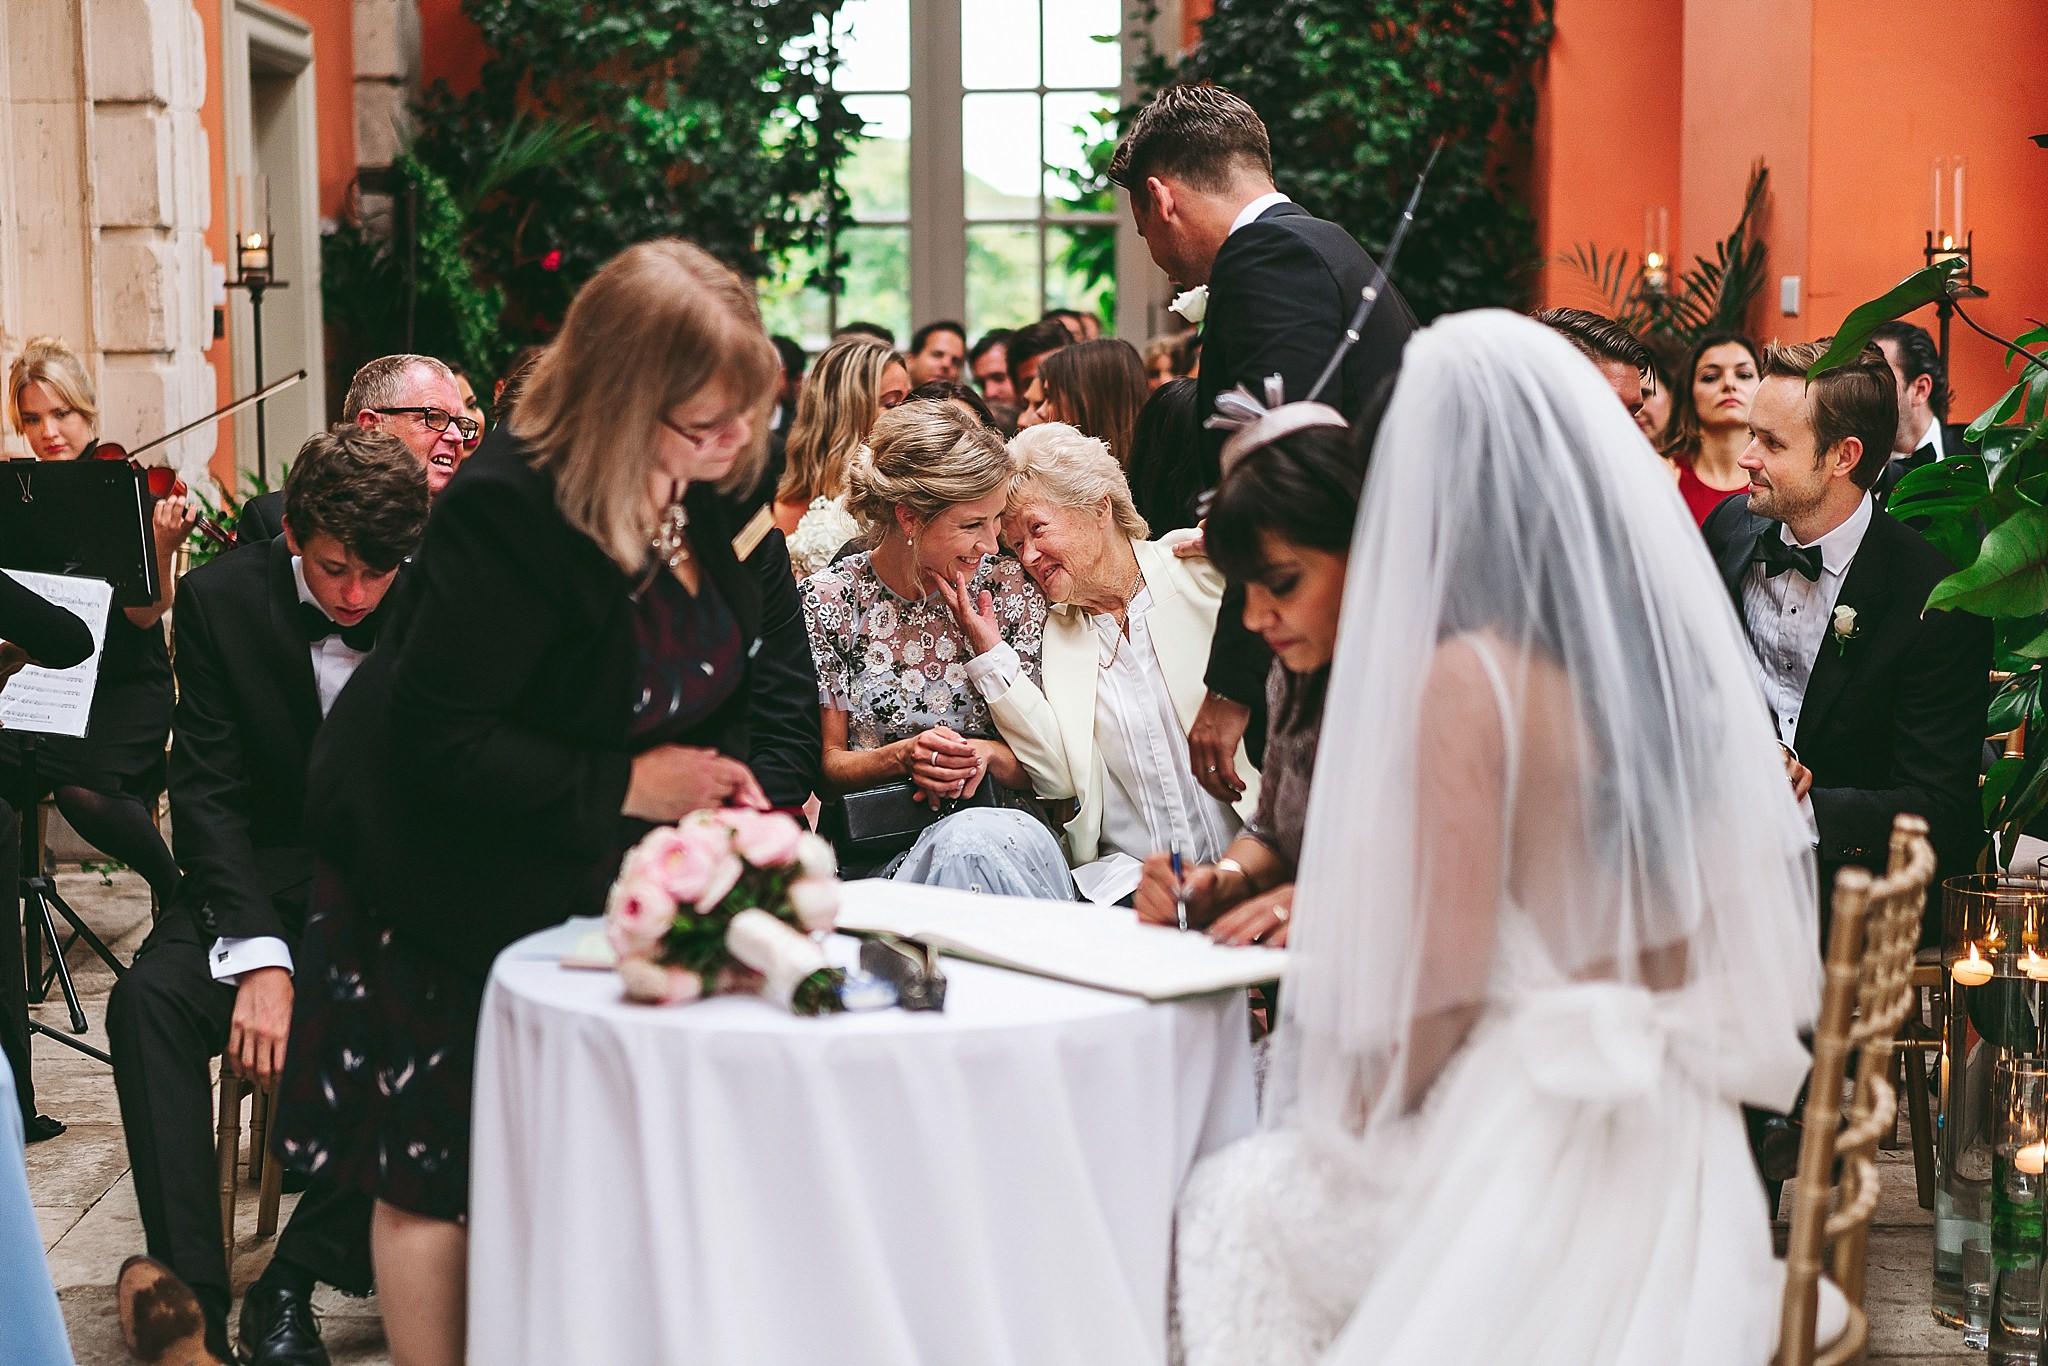 aga-tomaszek-wedding-photographer-cardiff-2016_1013